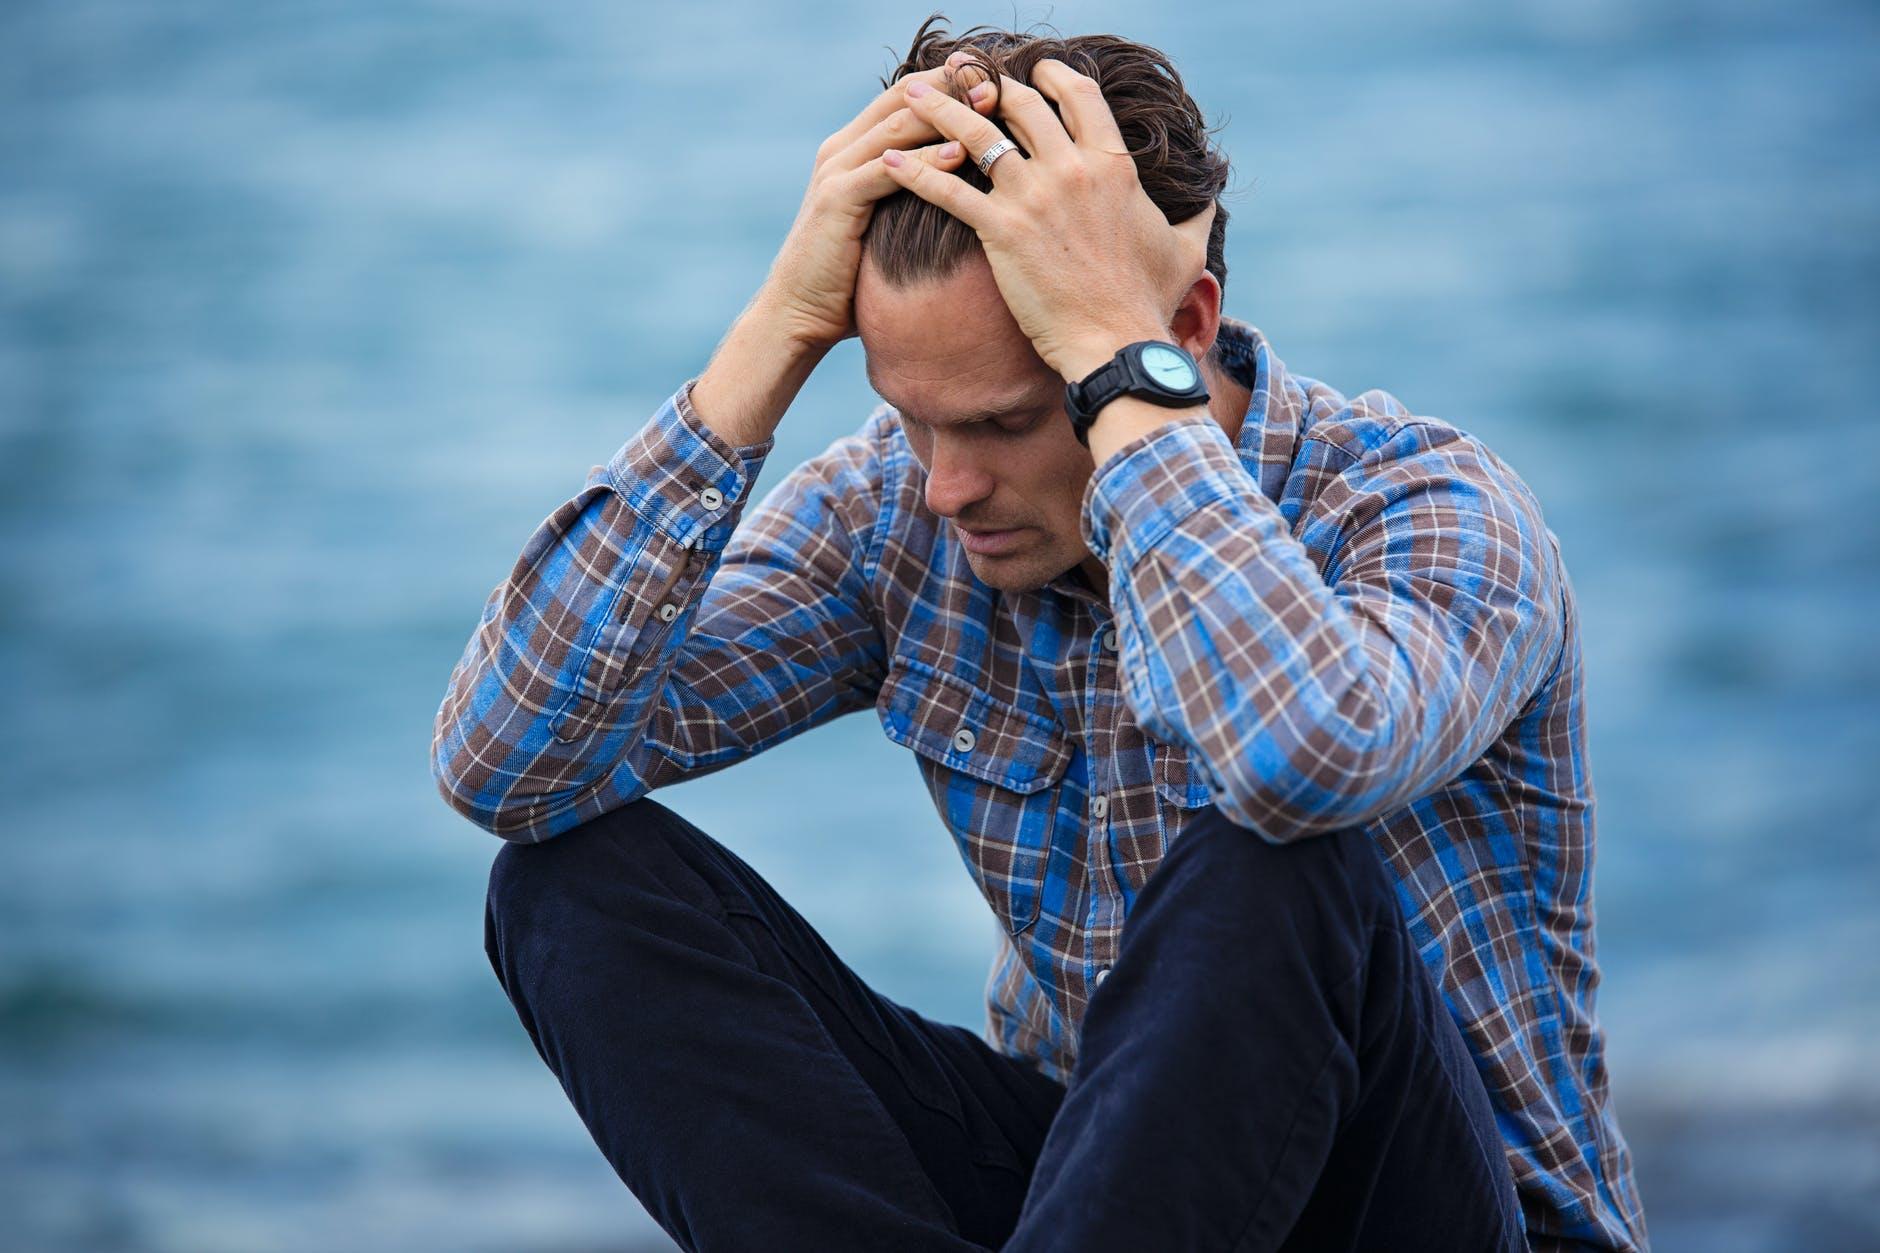 man in blue and brown plaid dress shirt touching his hair